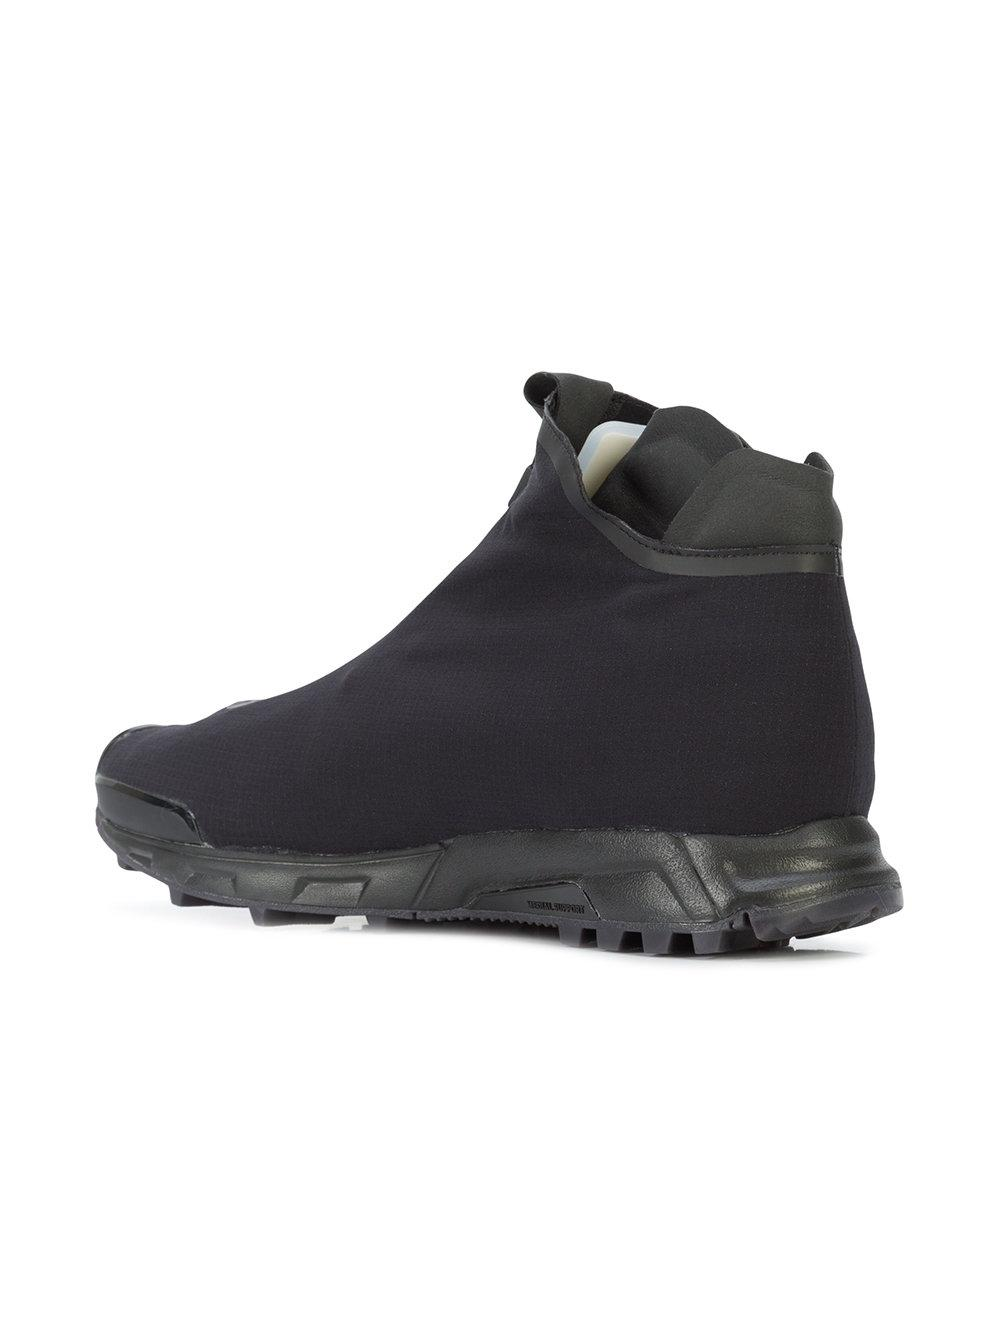 4e80d5b7f00 Cottweiler Black Reebok X Desert Hi-top Sneakers for men